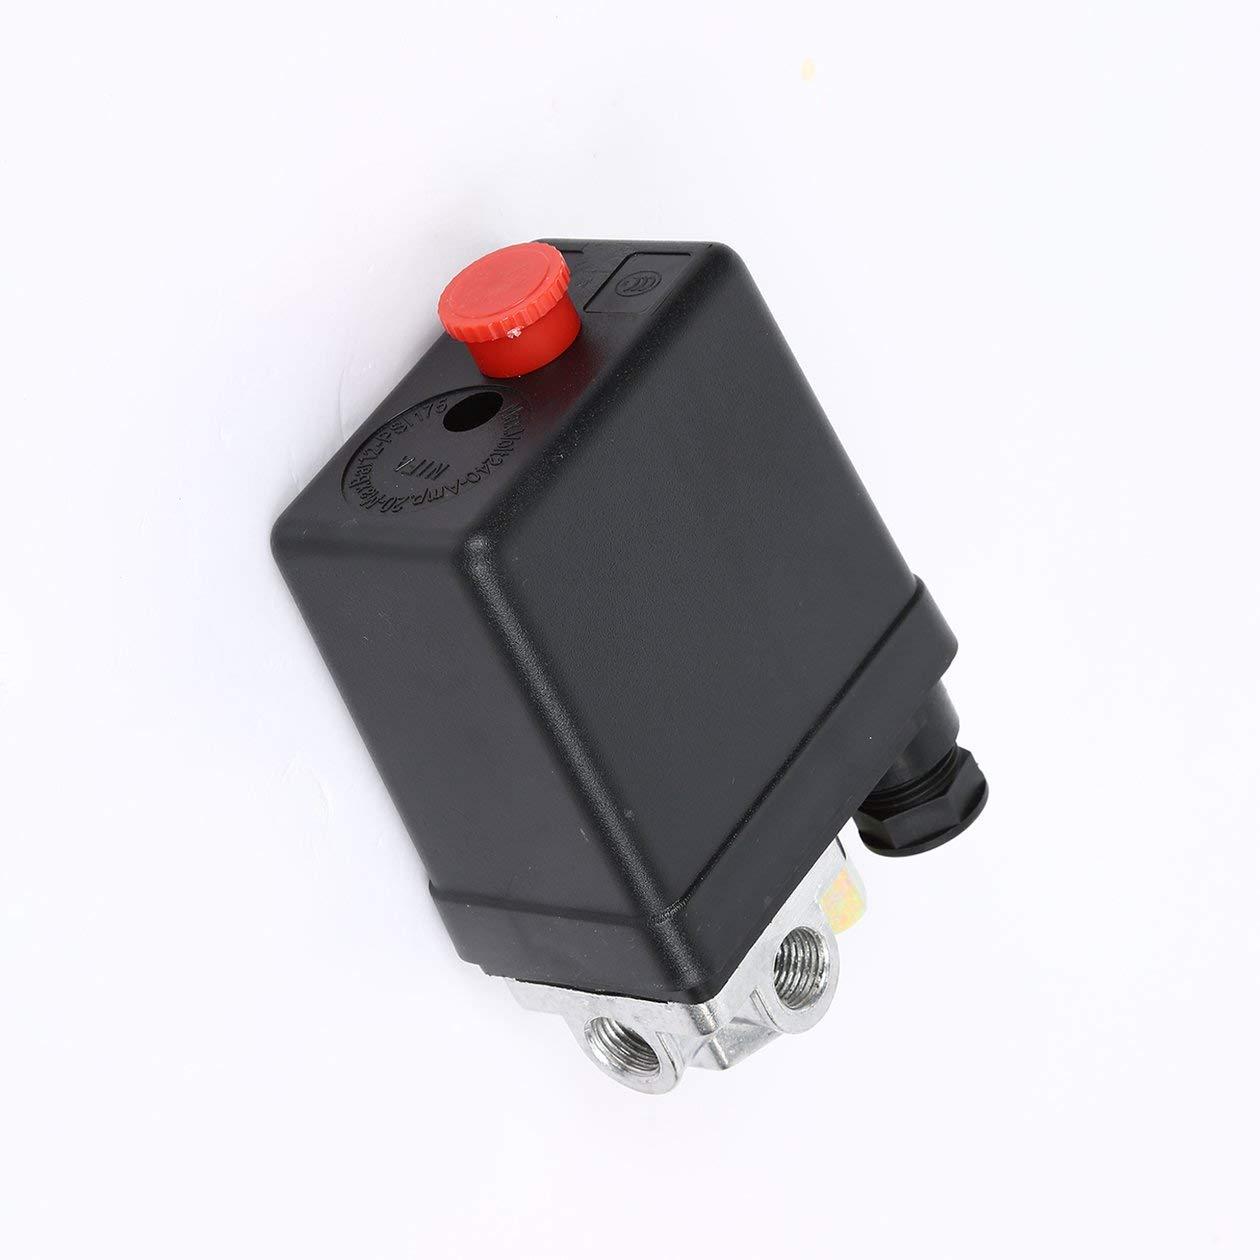 HONZIRY Heavy Duty 240V 16A Control autom/ático Carga//Descarga autom/ática Compresor de Aire Interruptor de presi/ón V/álvula de Control 90 PSI 120 PSI Color: Negro